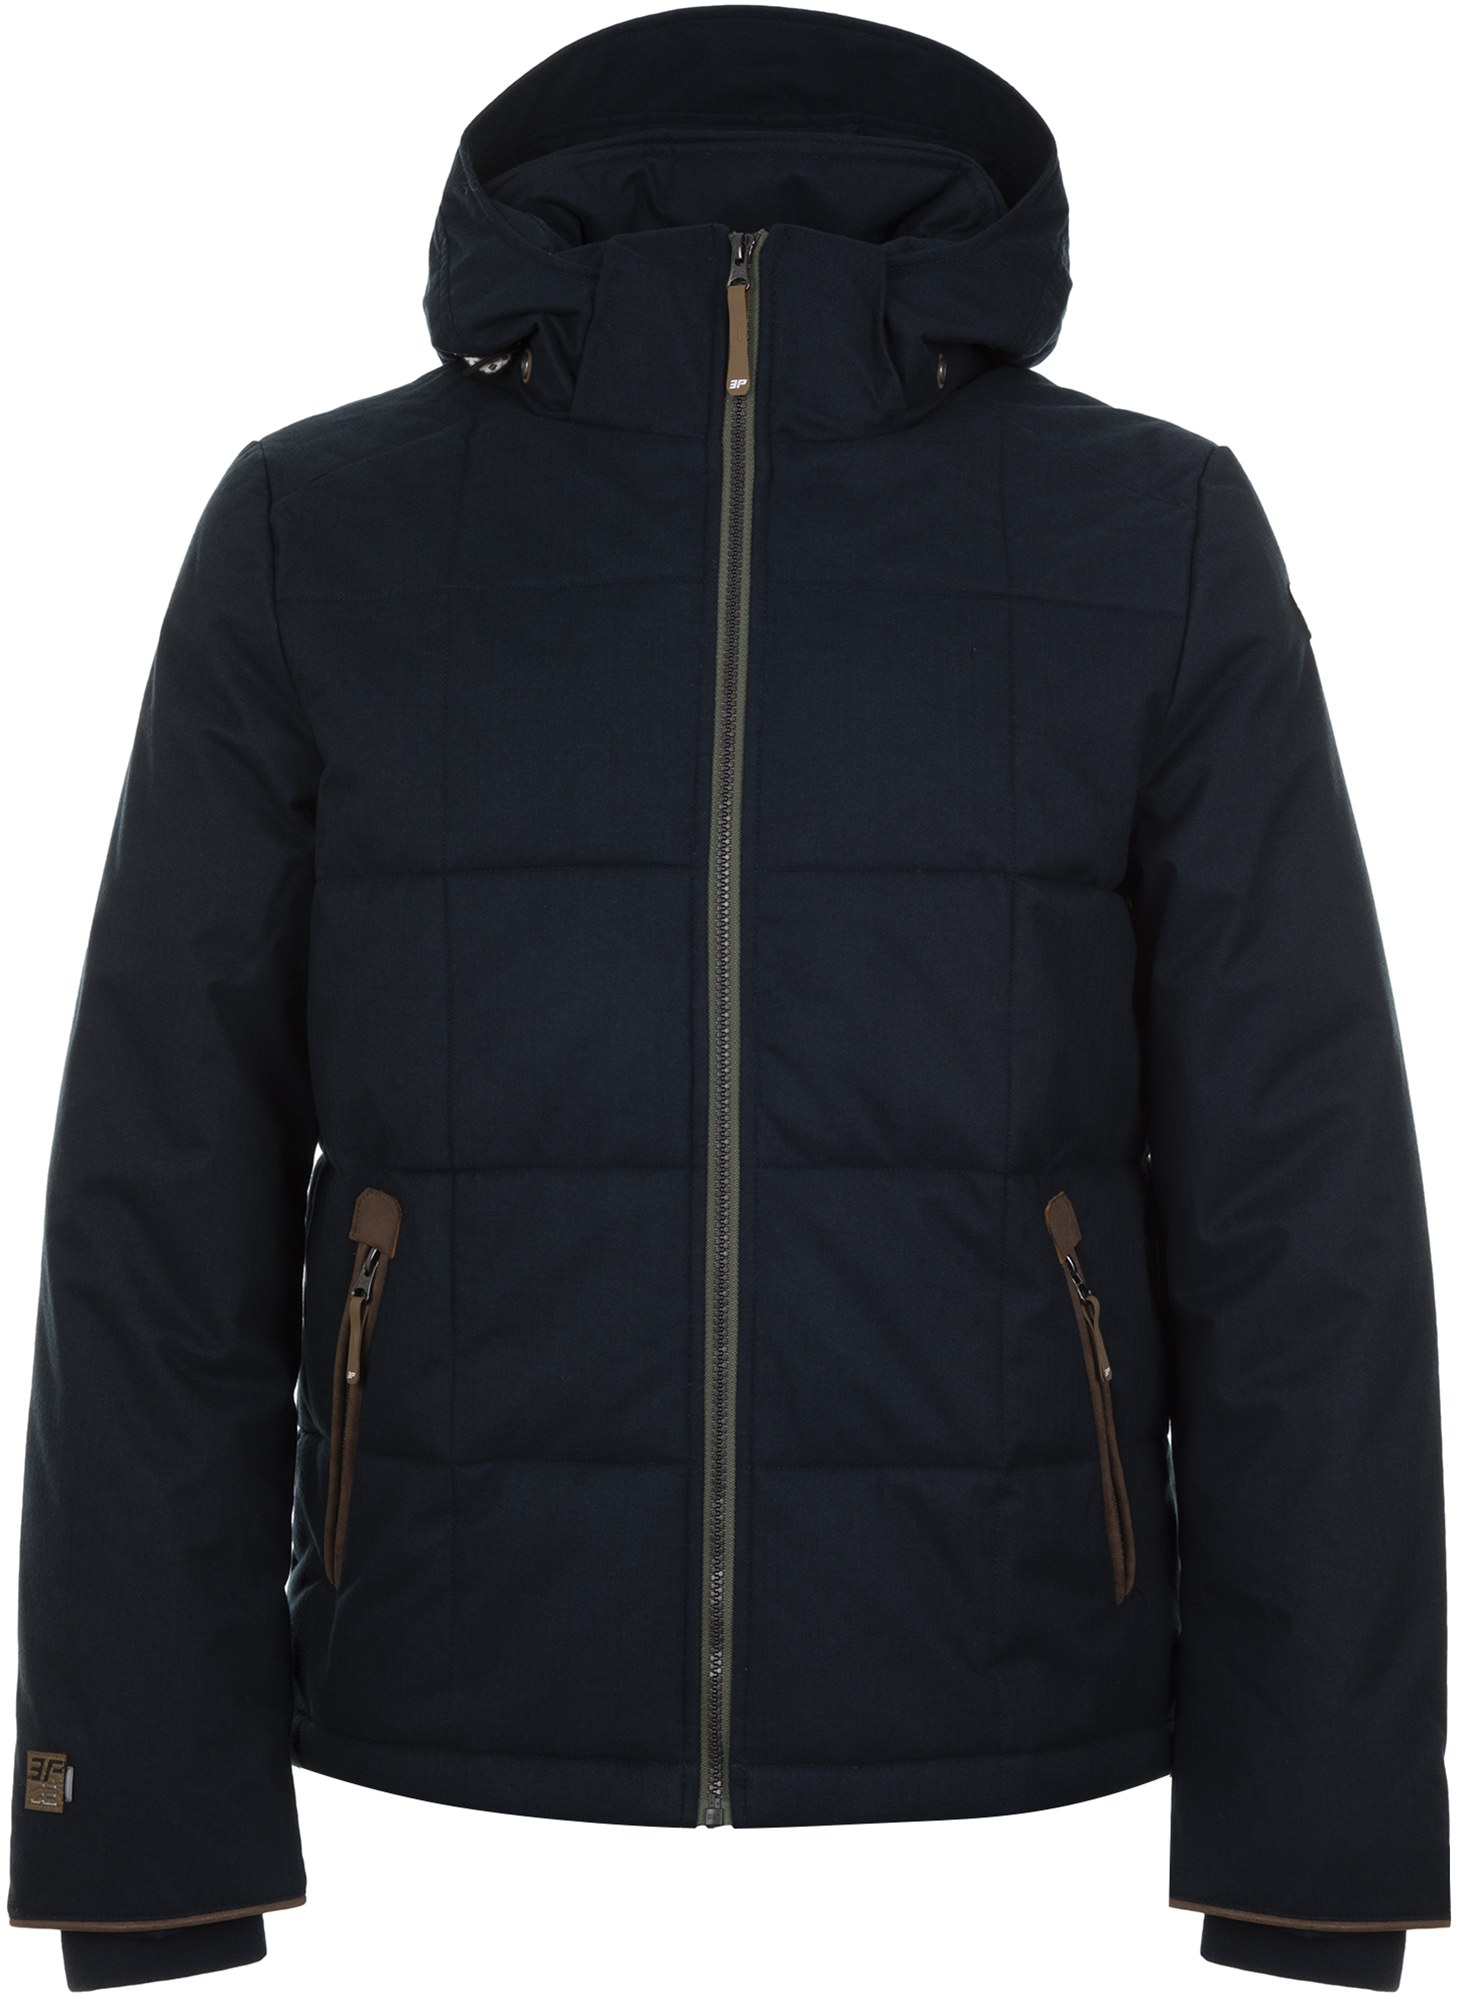 IcePeak Куртка утепленная мужская IcePeak Tian, размер 48 icepeak рюкзак icepeak размер без размера